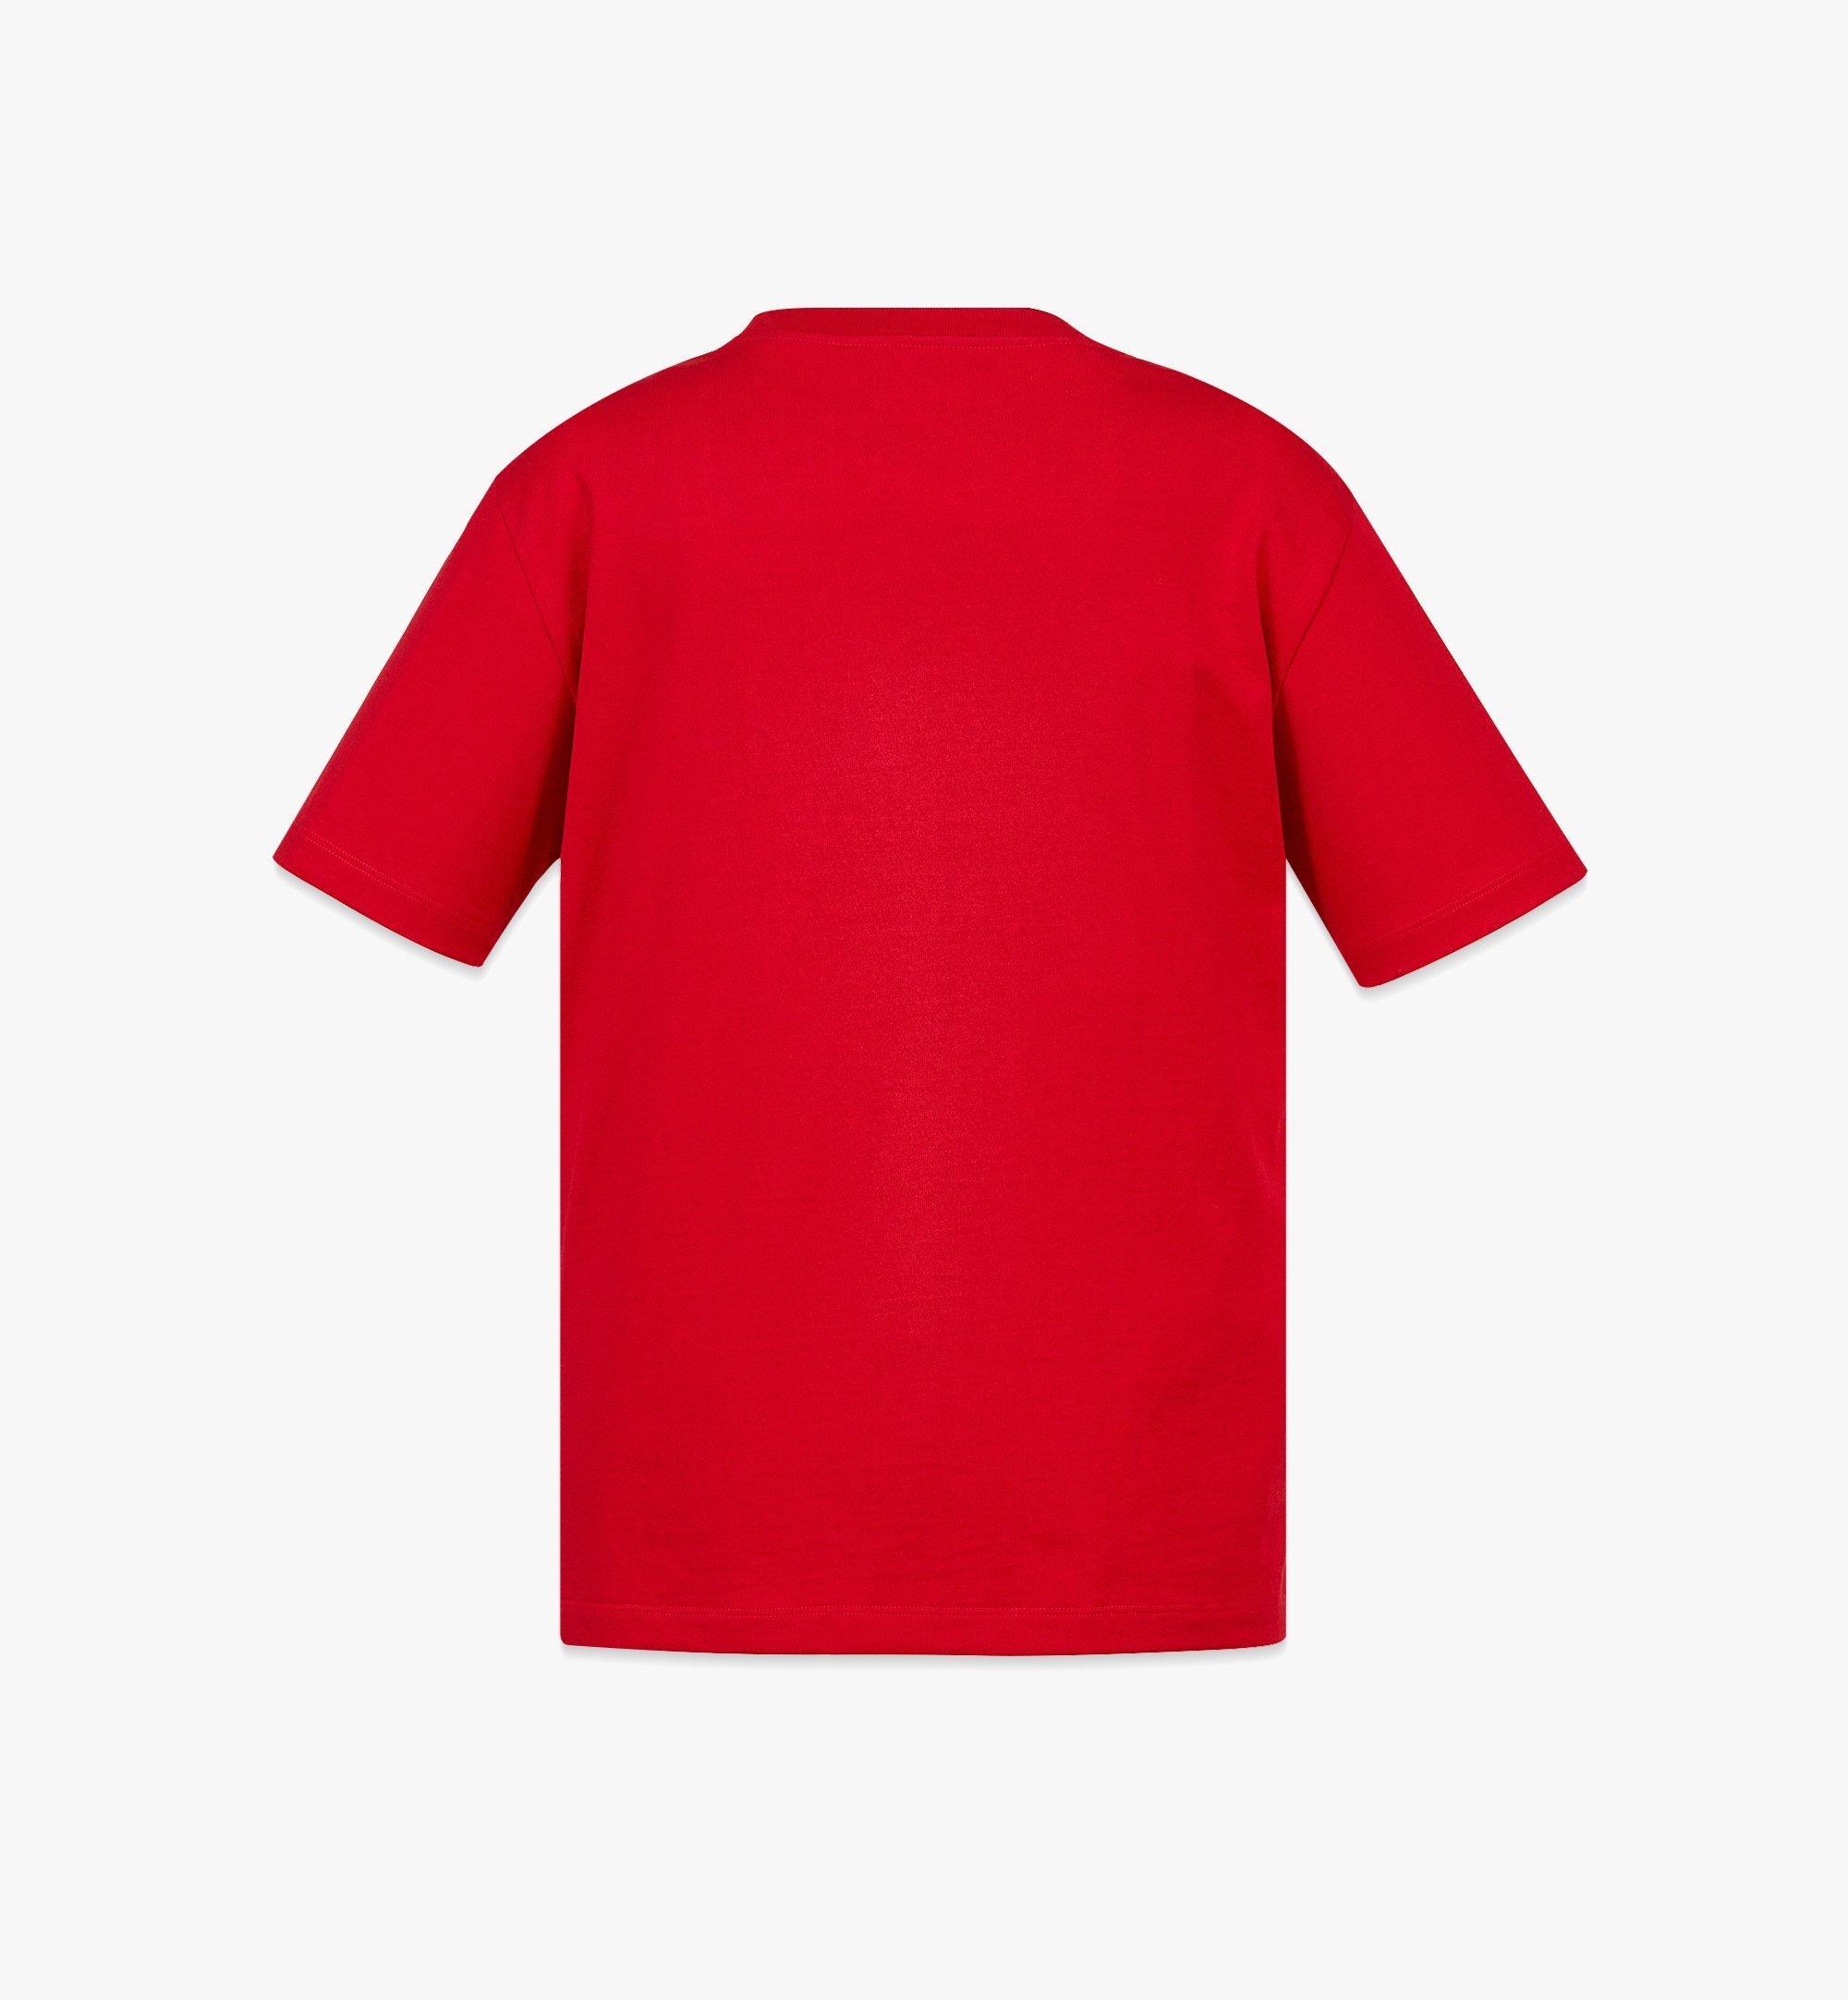 MCM Women's Organic Cotton T-Shirt with Nylon Zip Pocket Red MFTBAMM02R000L Alternate View 1